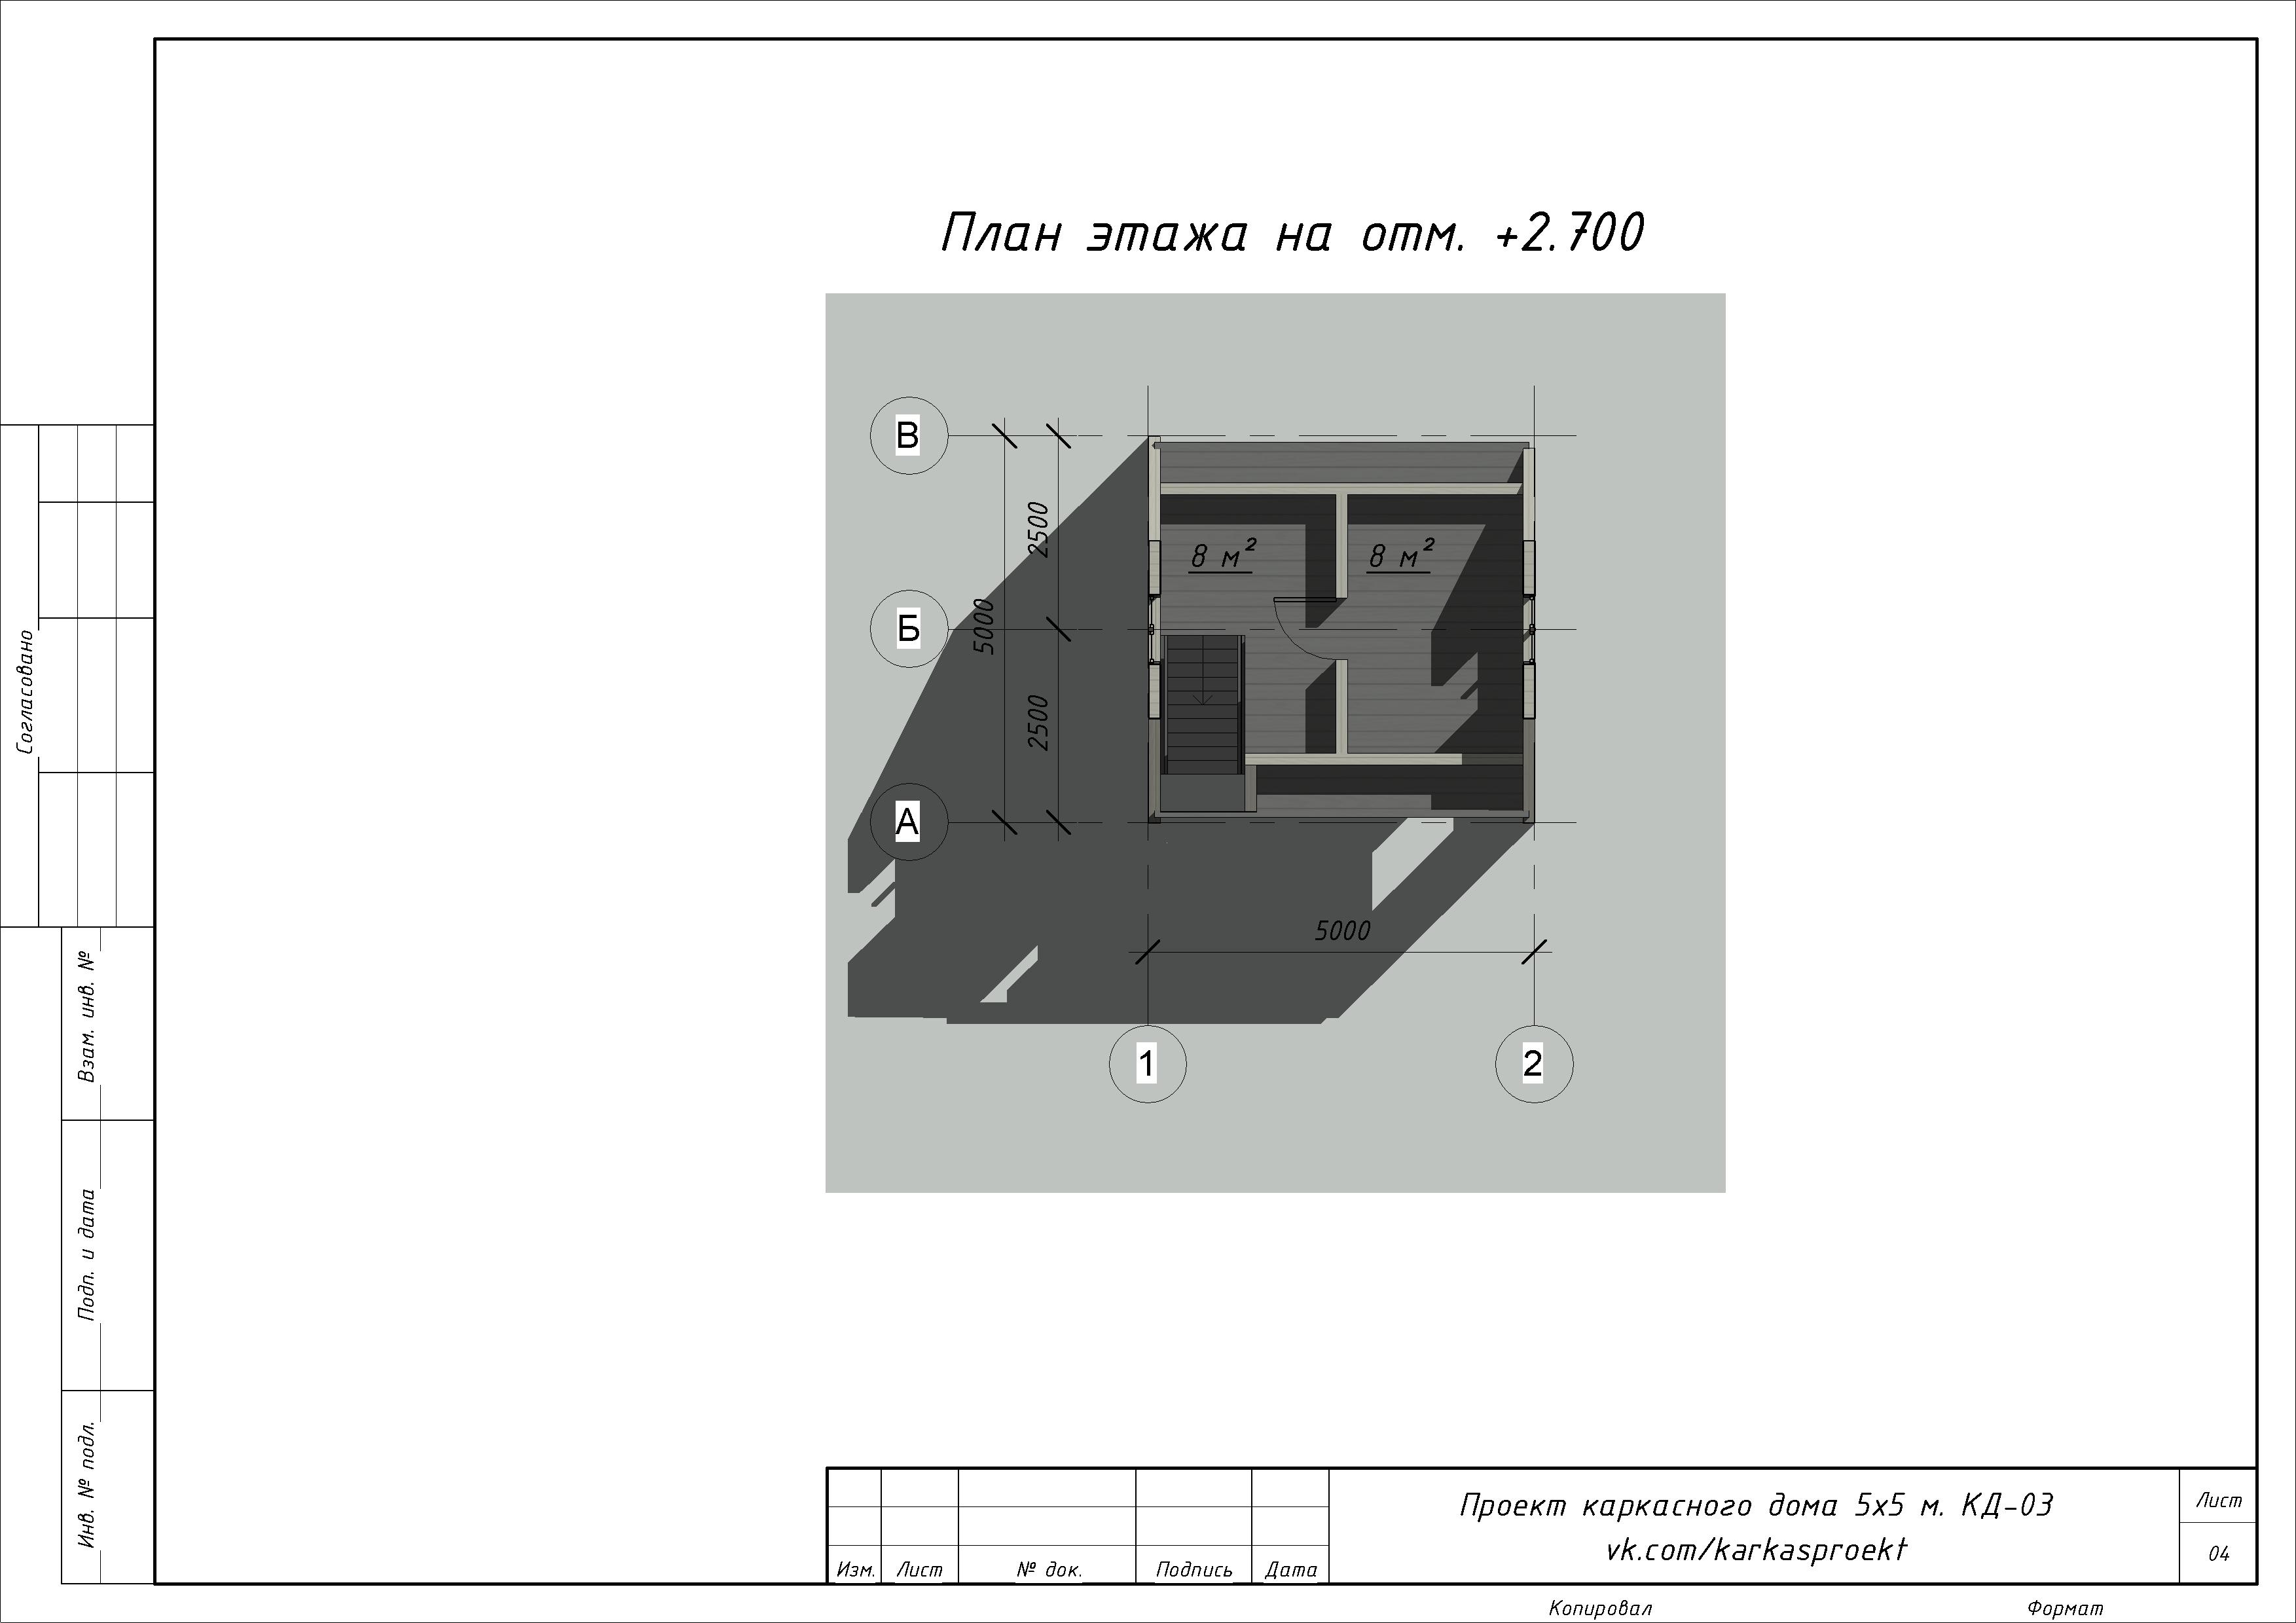 КД-03 План 2-го этажа